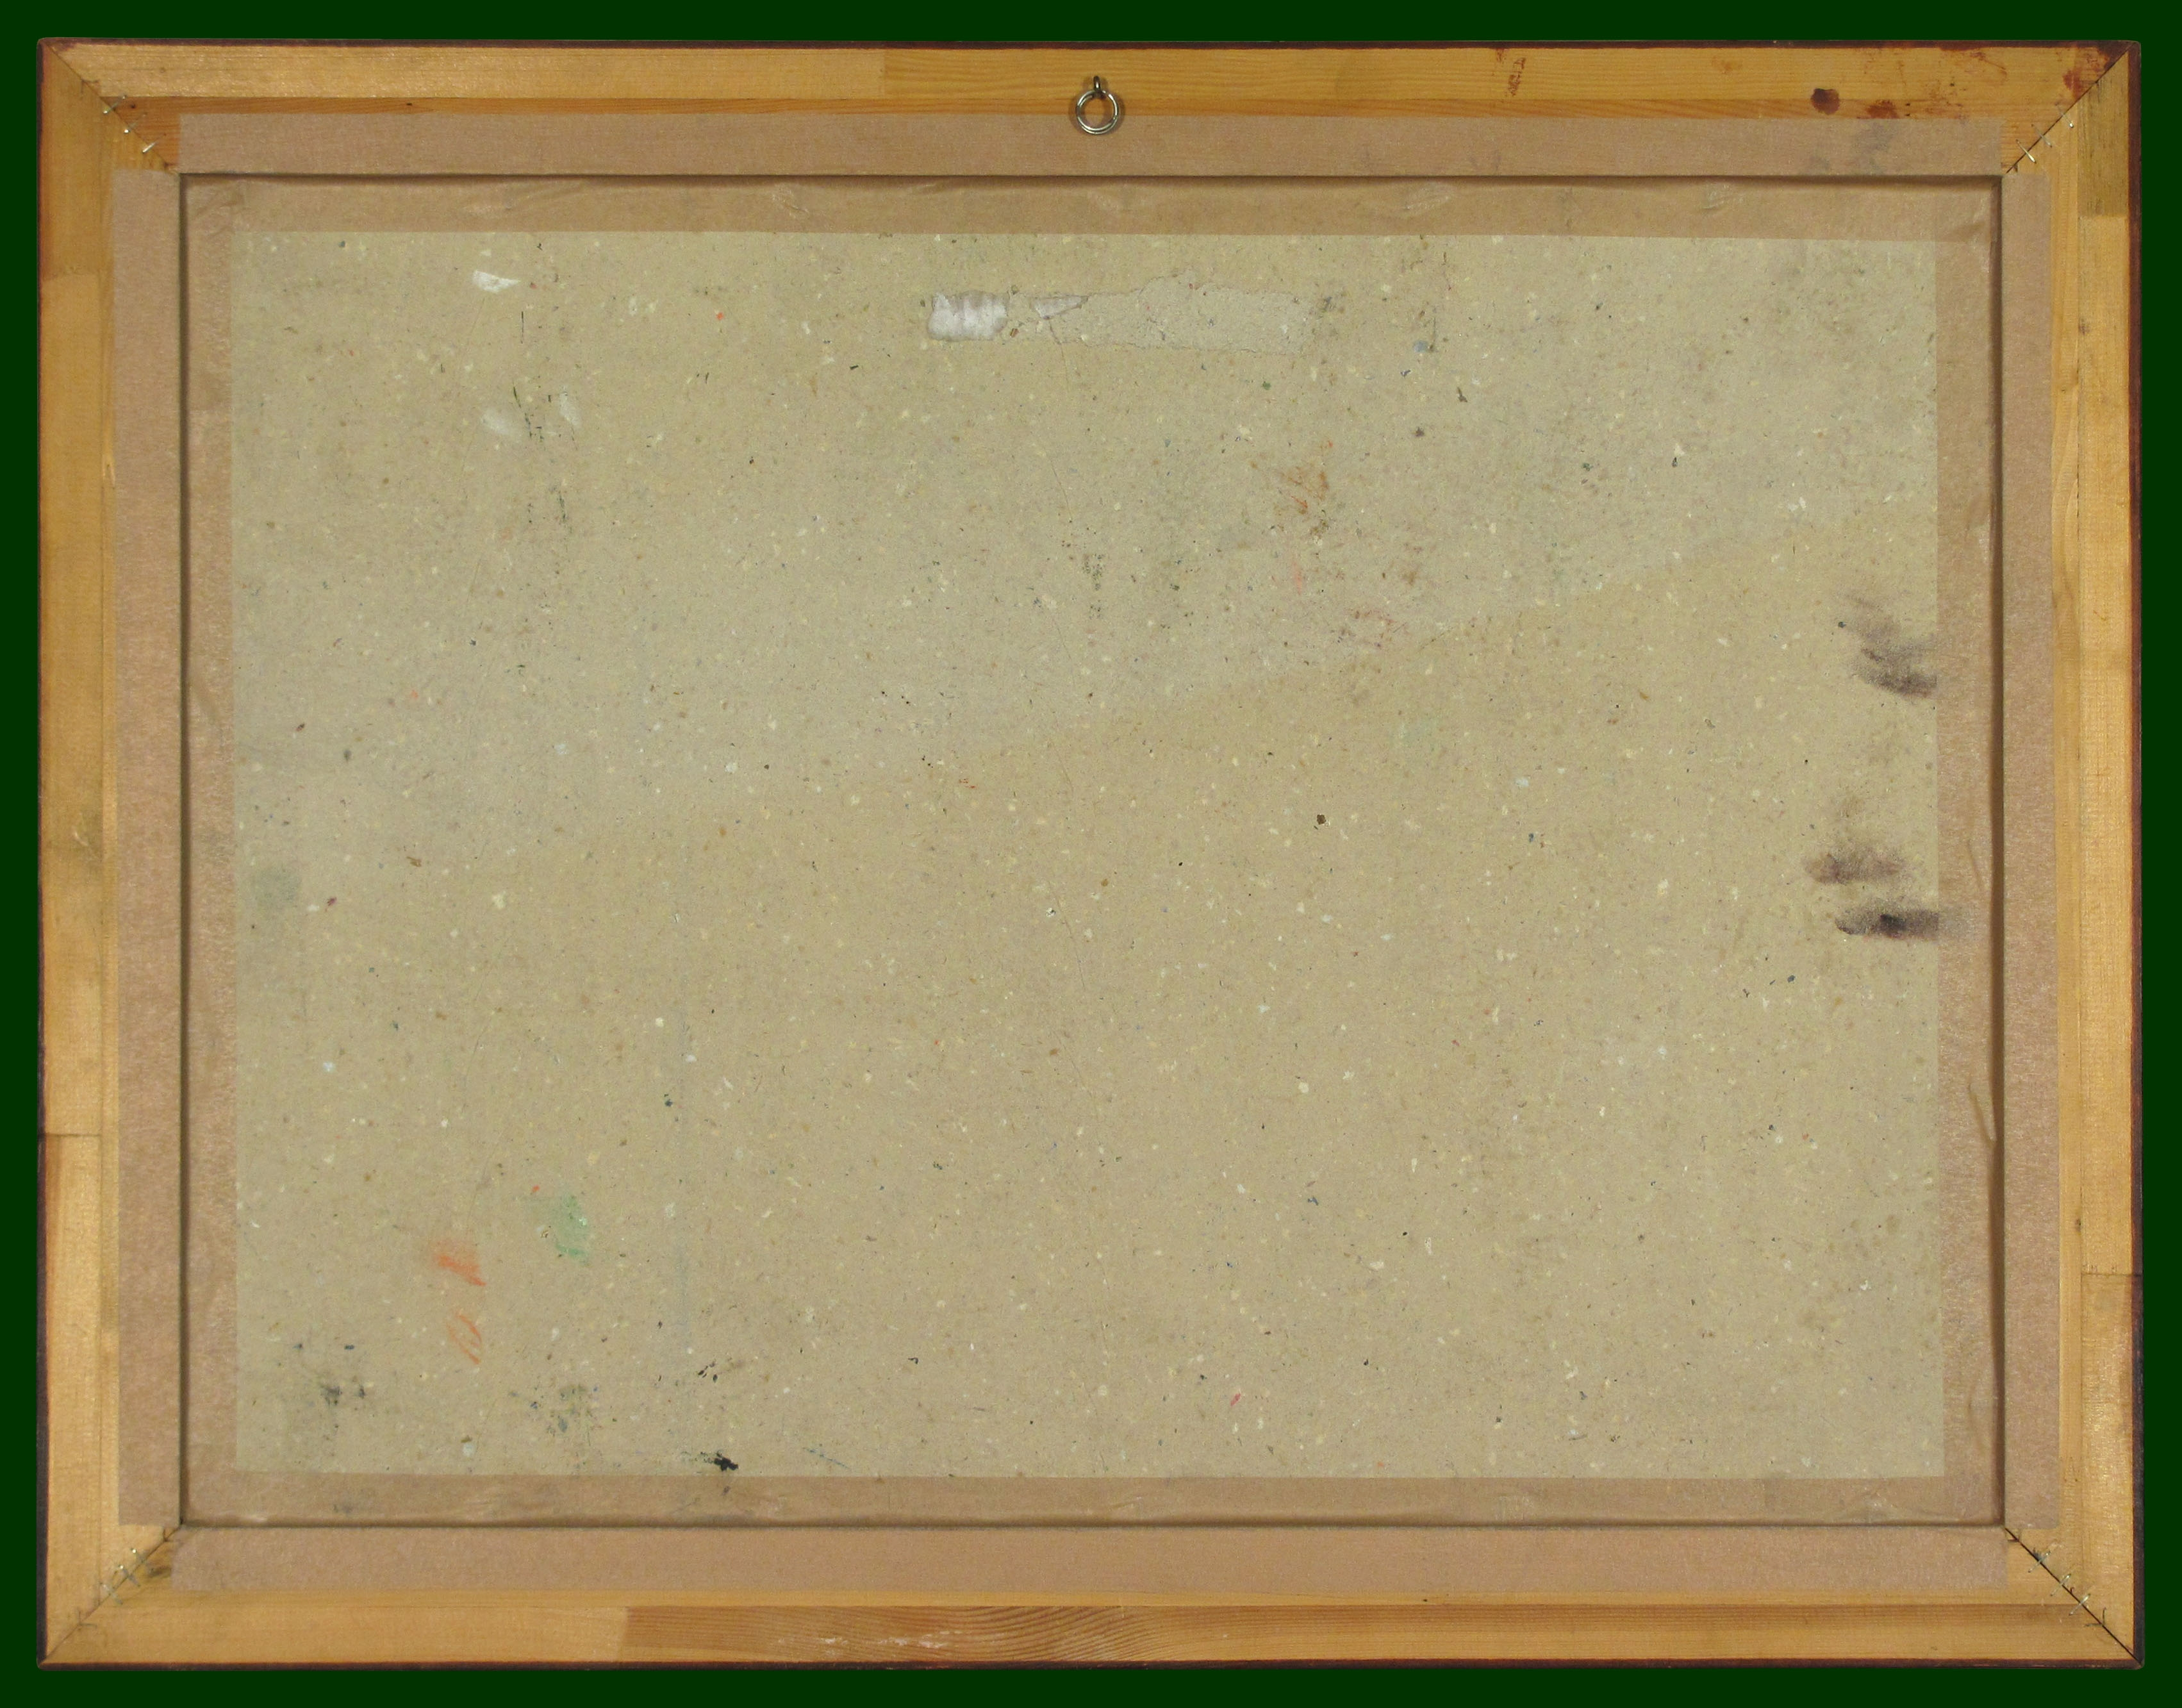 1-21hát.jpg (3405×2665)